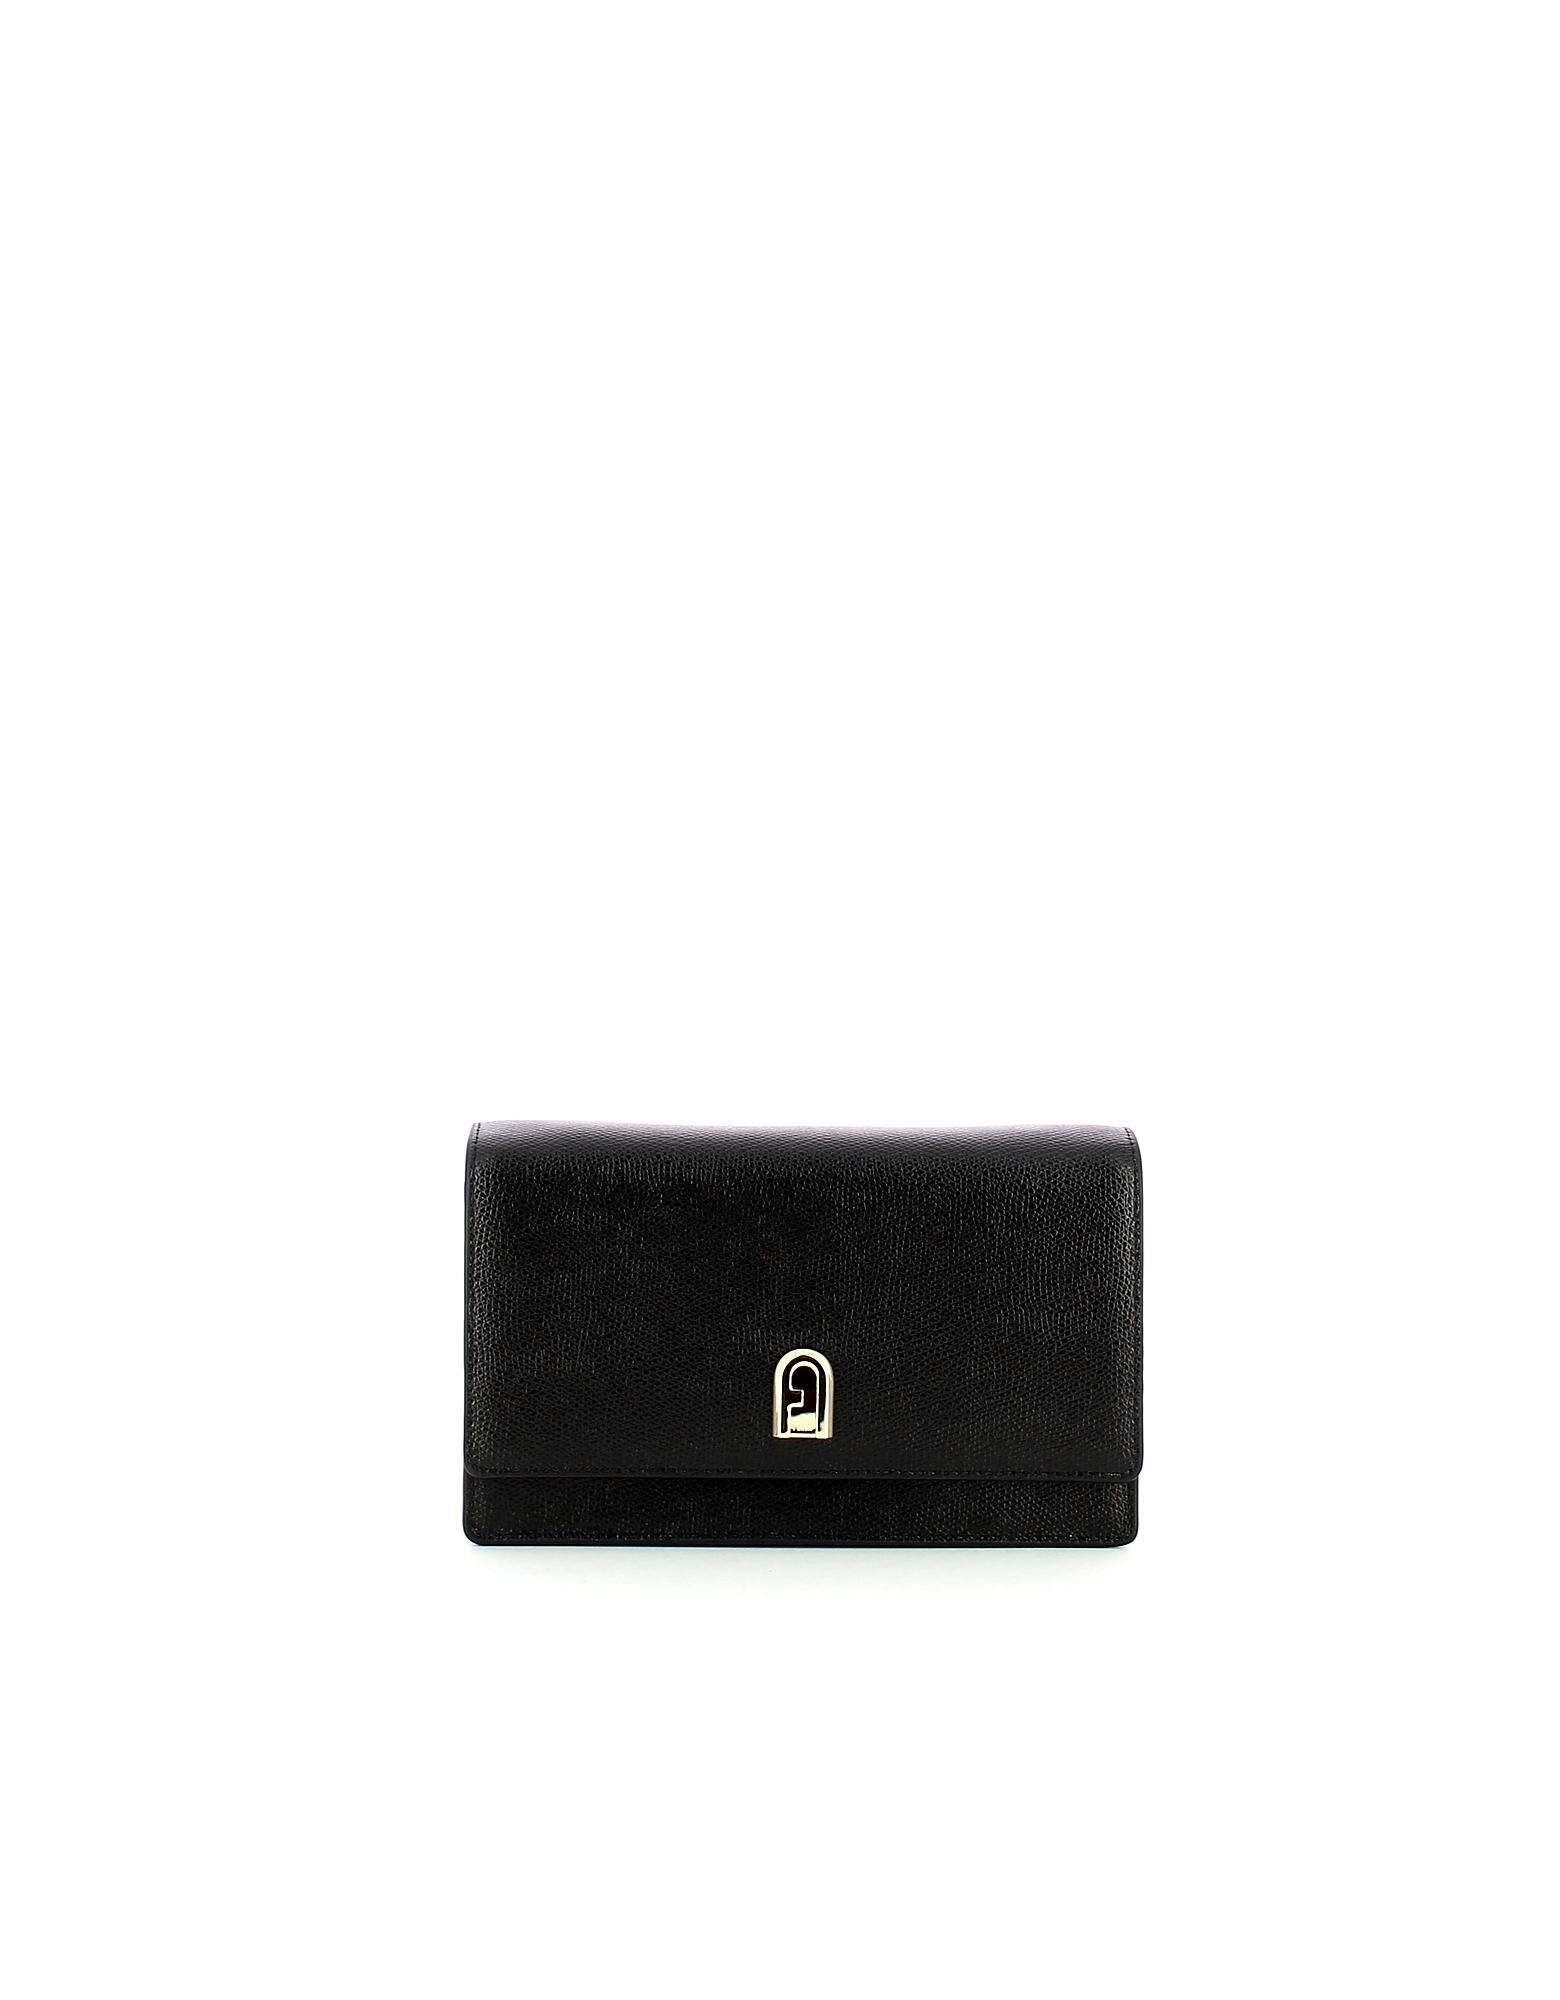 Furla Designer Handbags, Black Mini 1927 Crossbody Bag